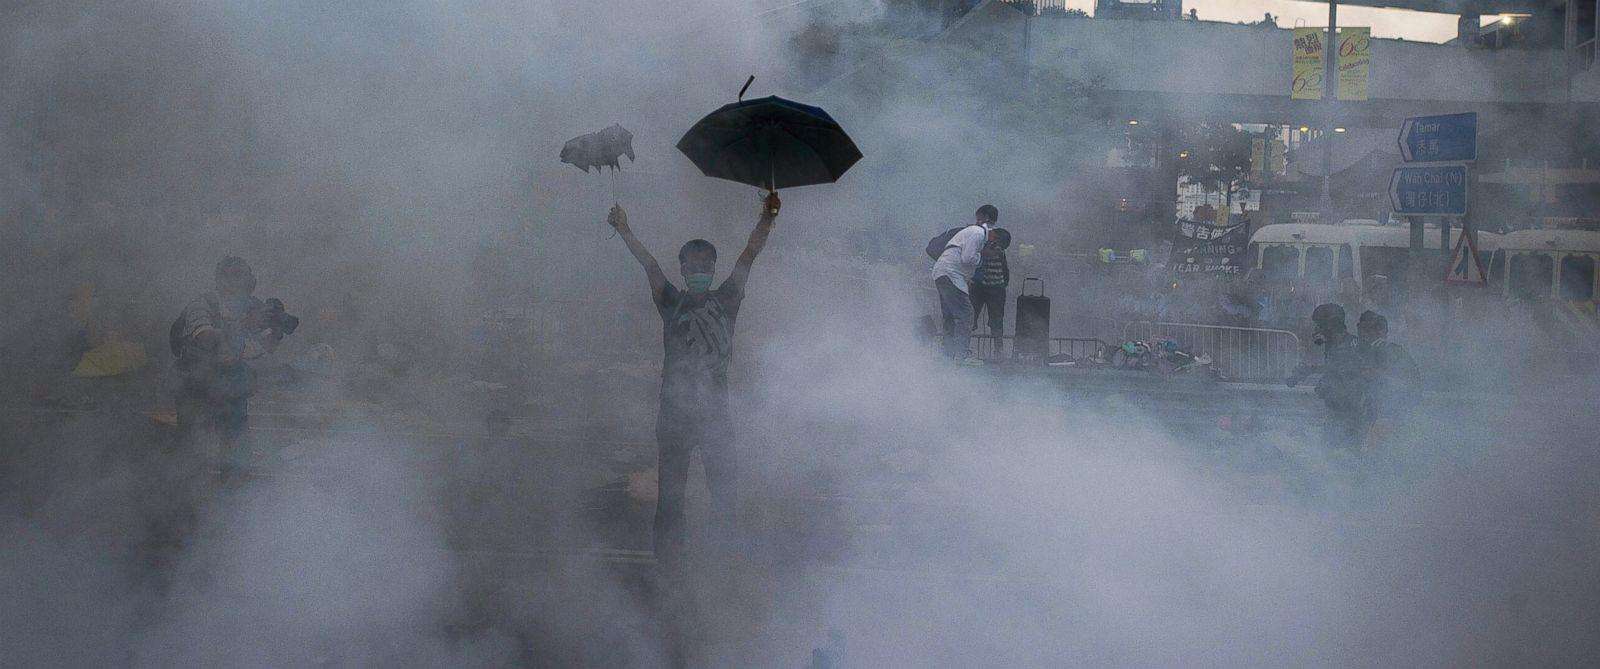 Good Morning America Umbrella : Iconic photo shows umbrella as symbol of hong kong s